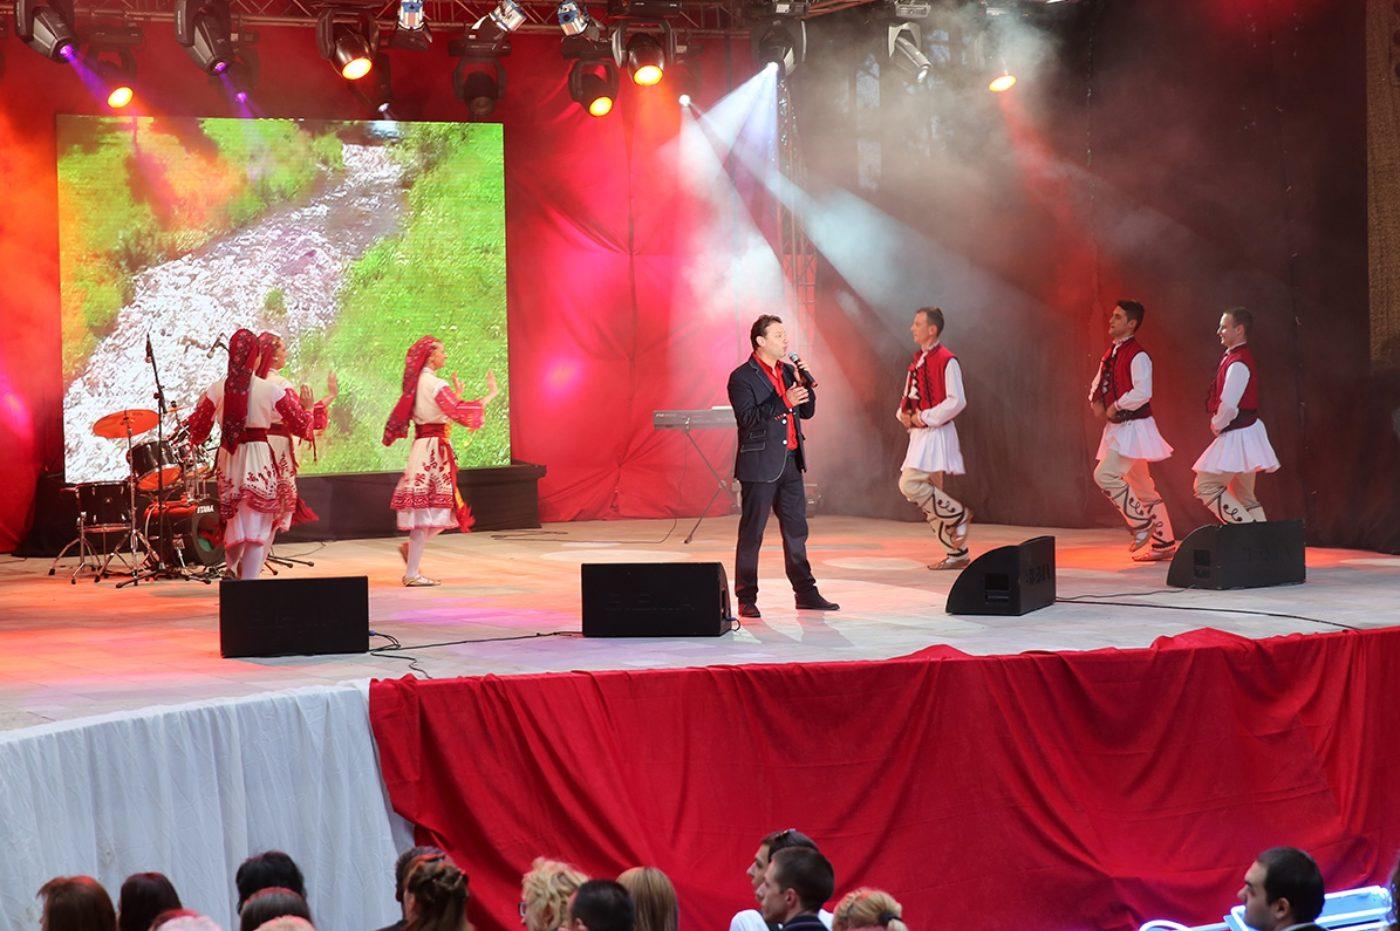 Янко Неделчев: Неописуема радост е да пееш пред 35 000 човека